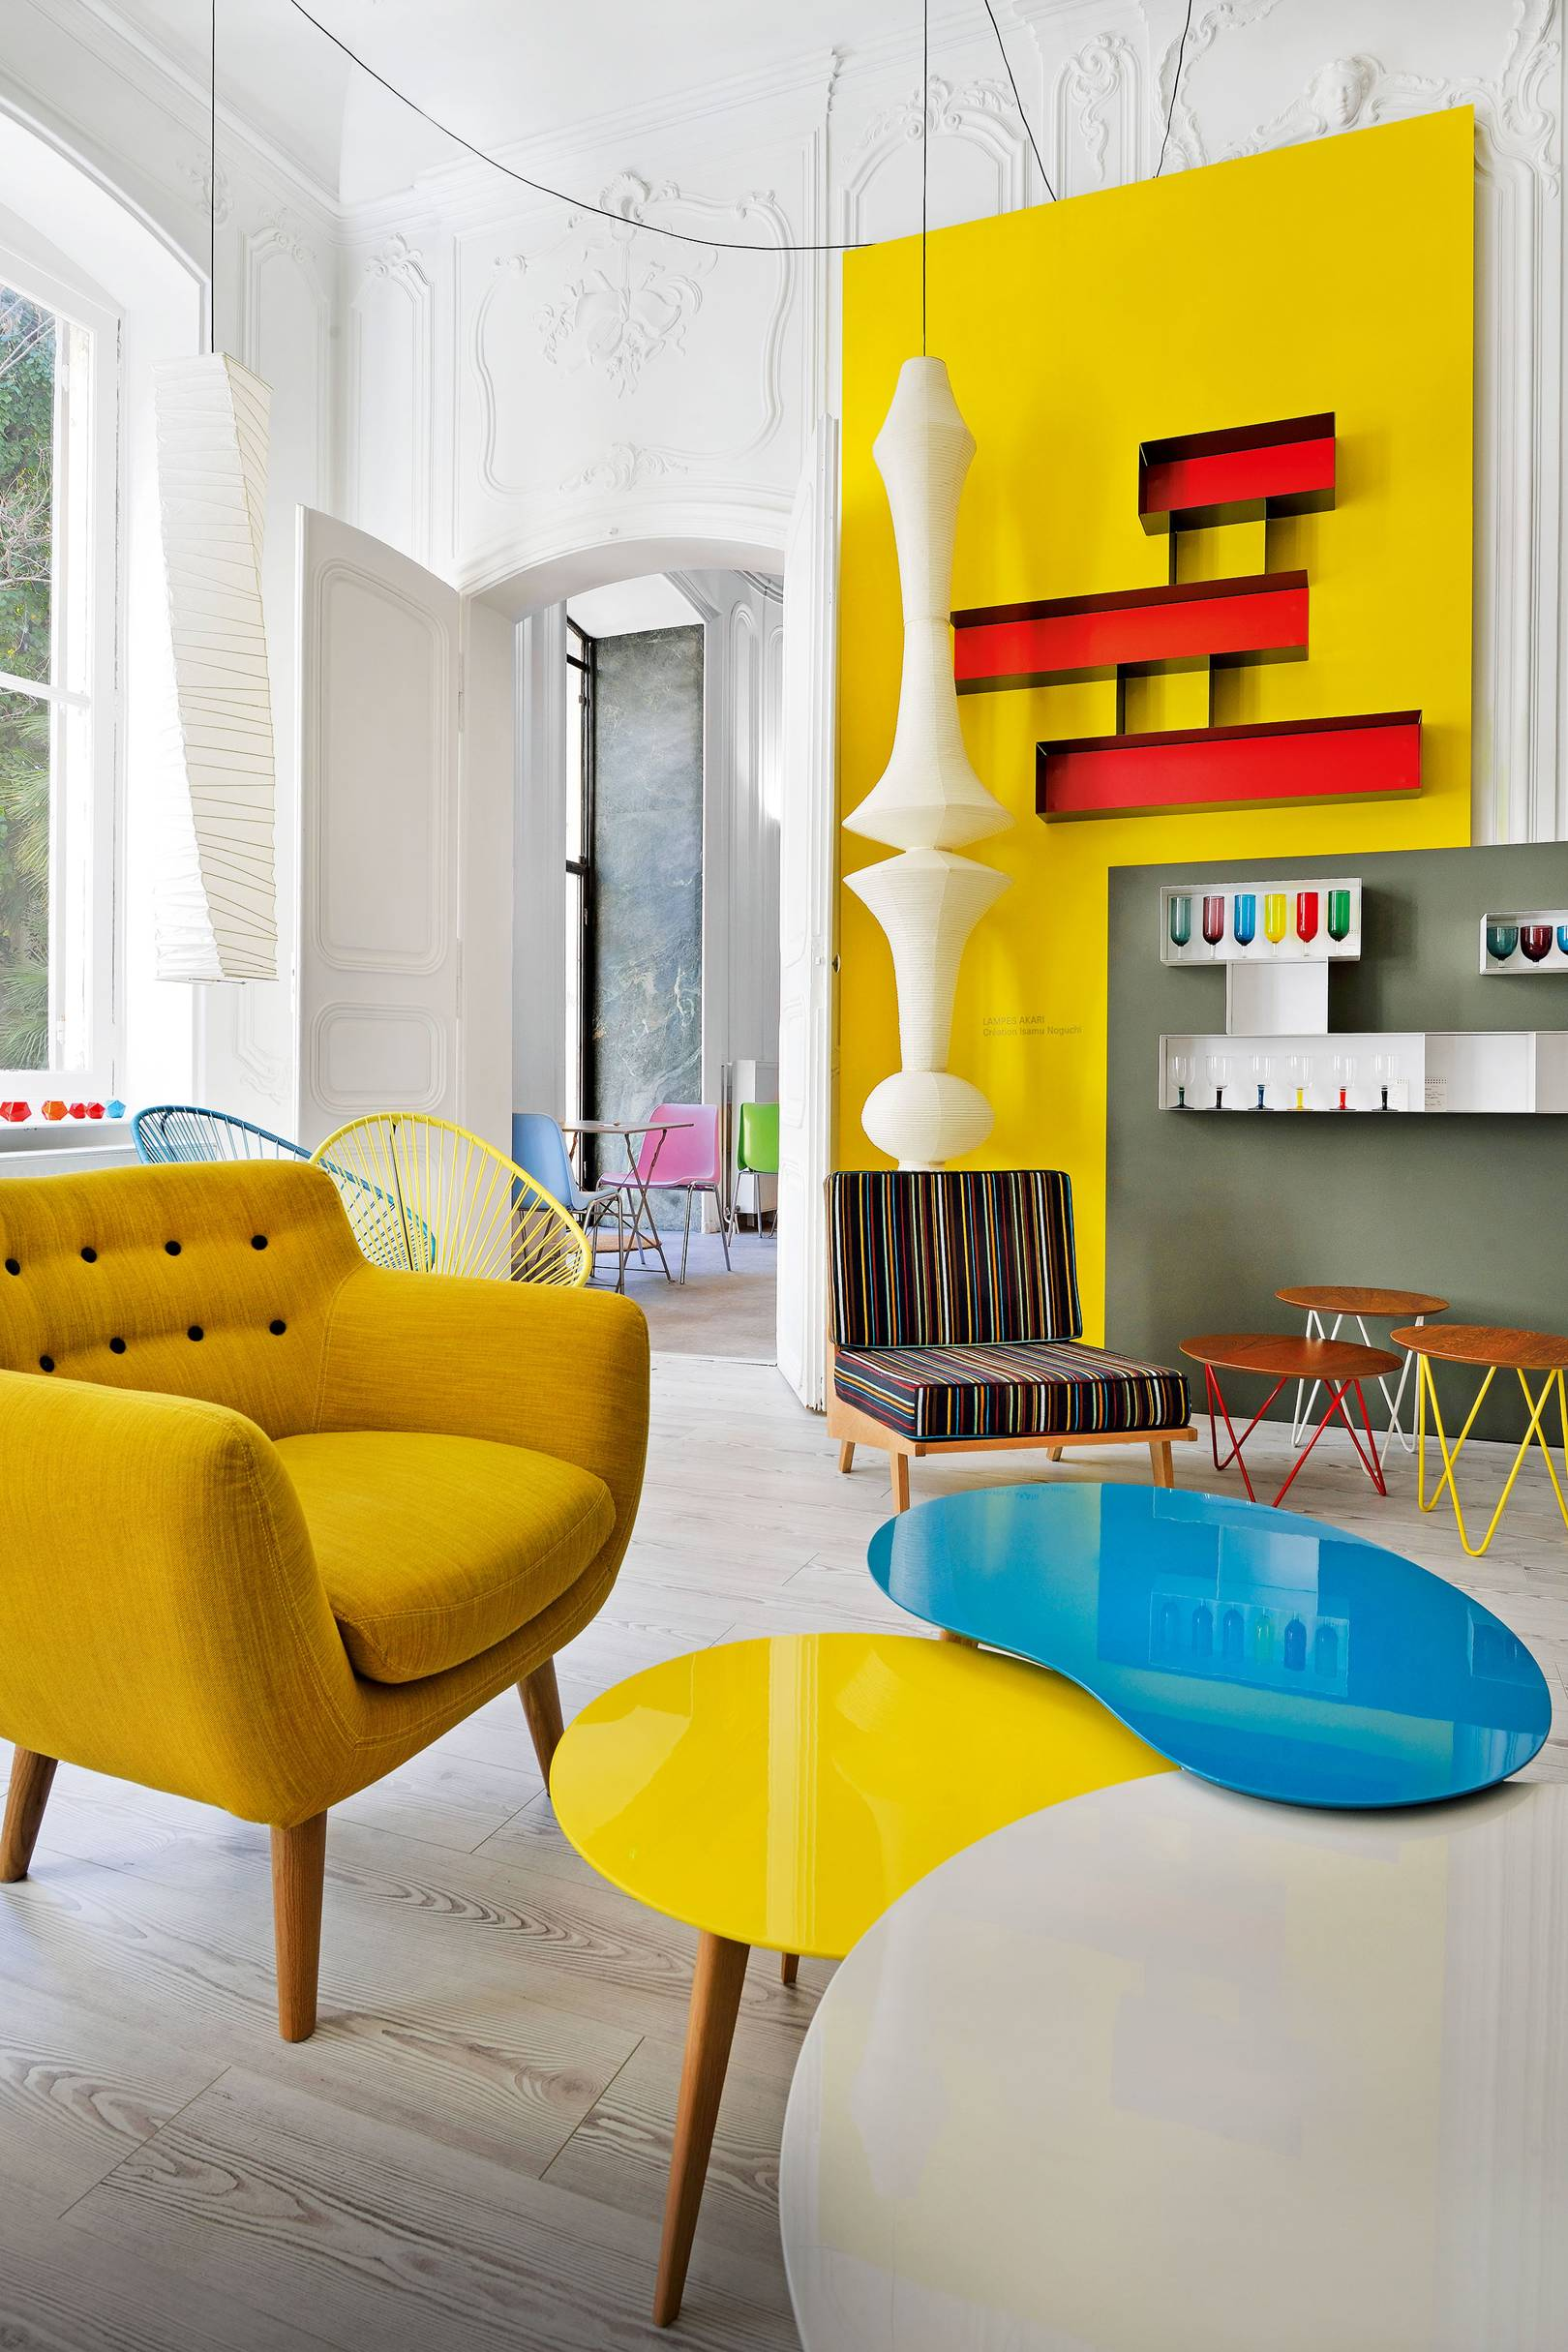 C Maison Et Jardin Magazine marseille shopping   cn traveller